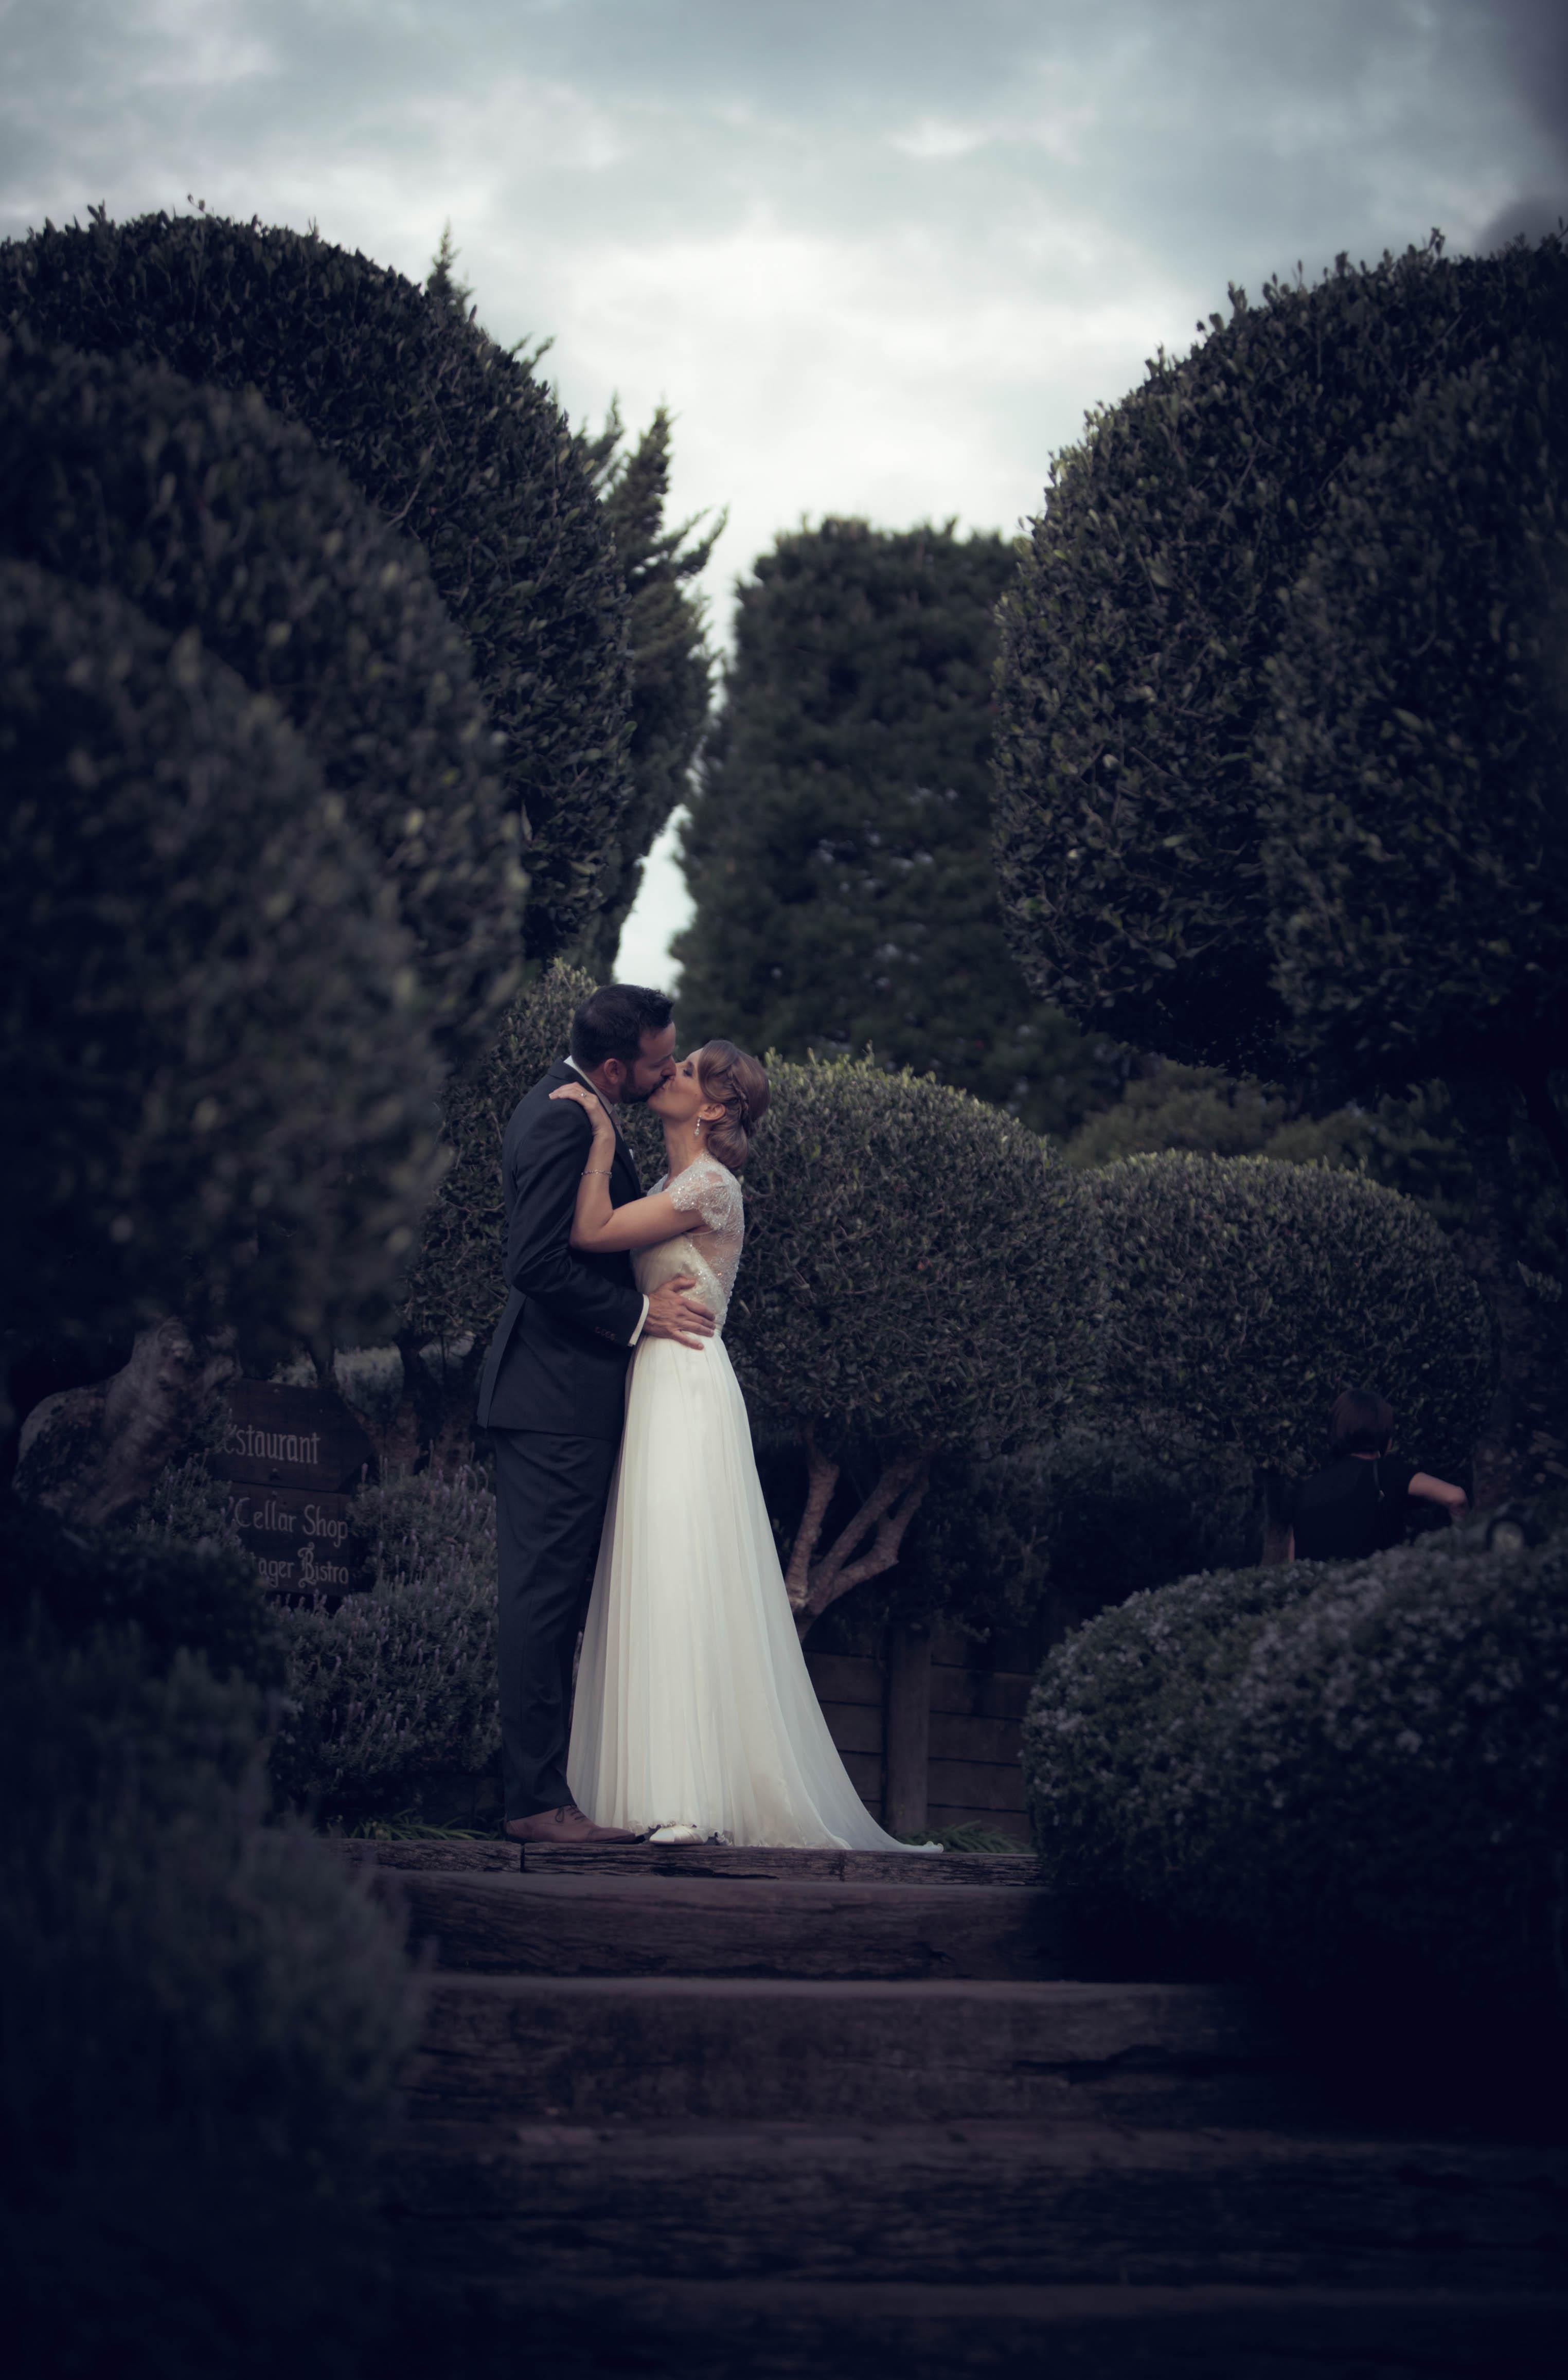 Auckland wedding photographer Chris Loufte, Mudbrick, Waiheke Island